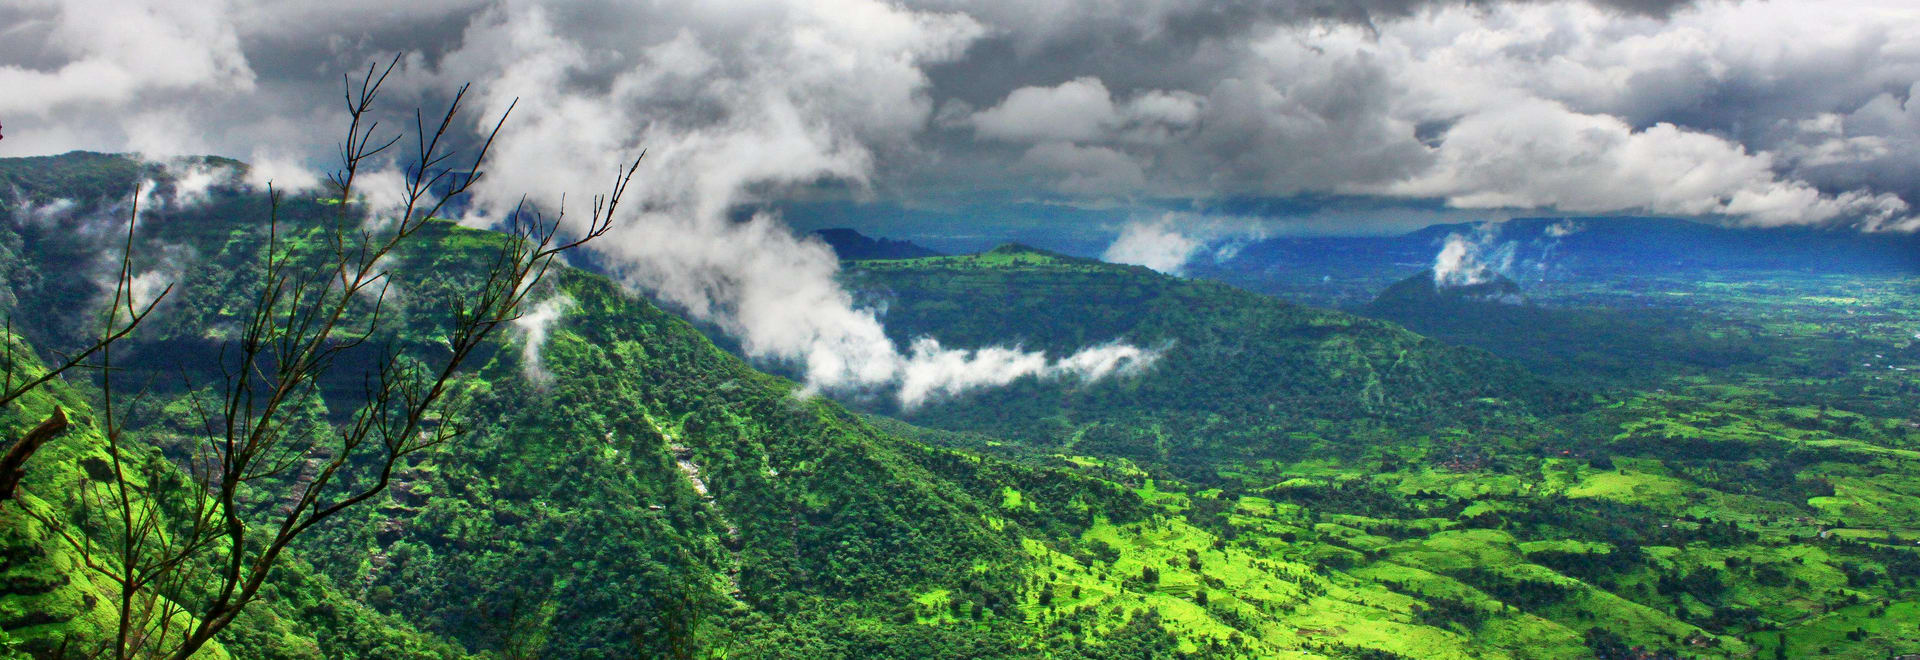 12 Best Hill Stations near Pune